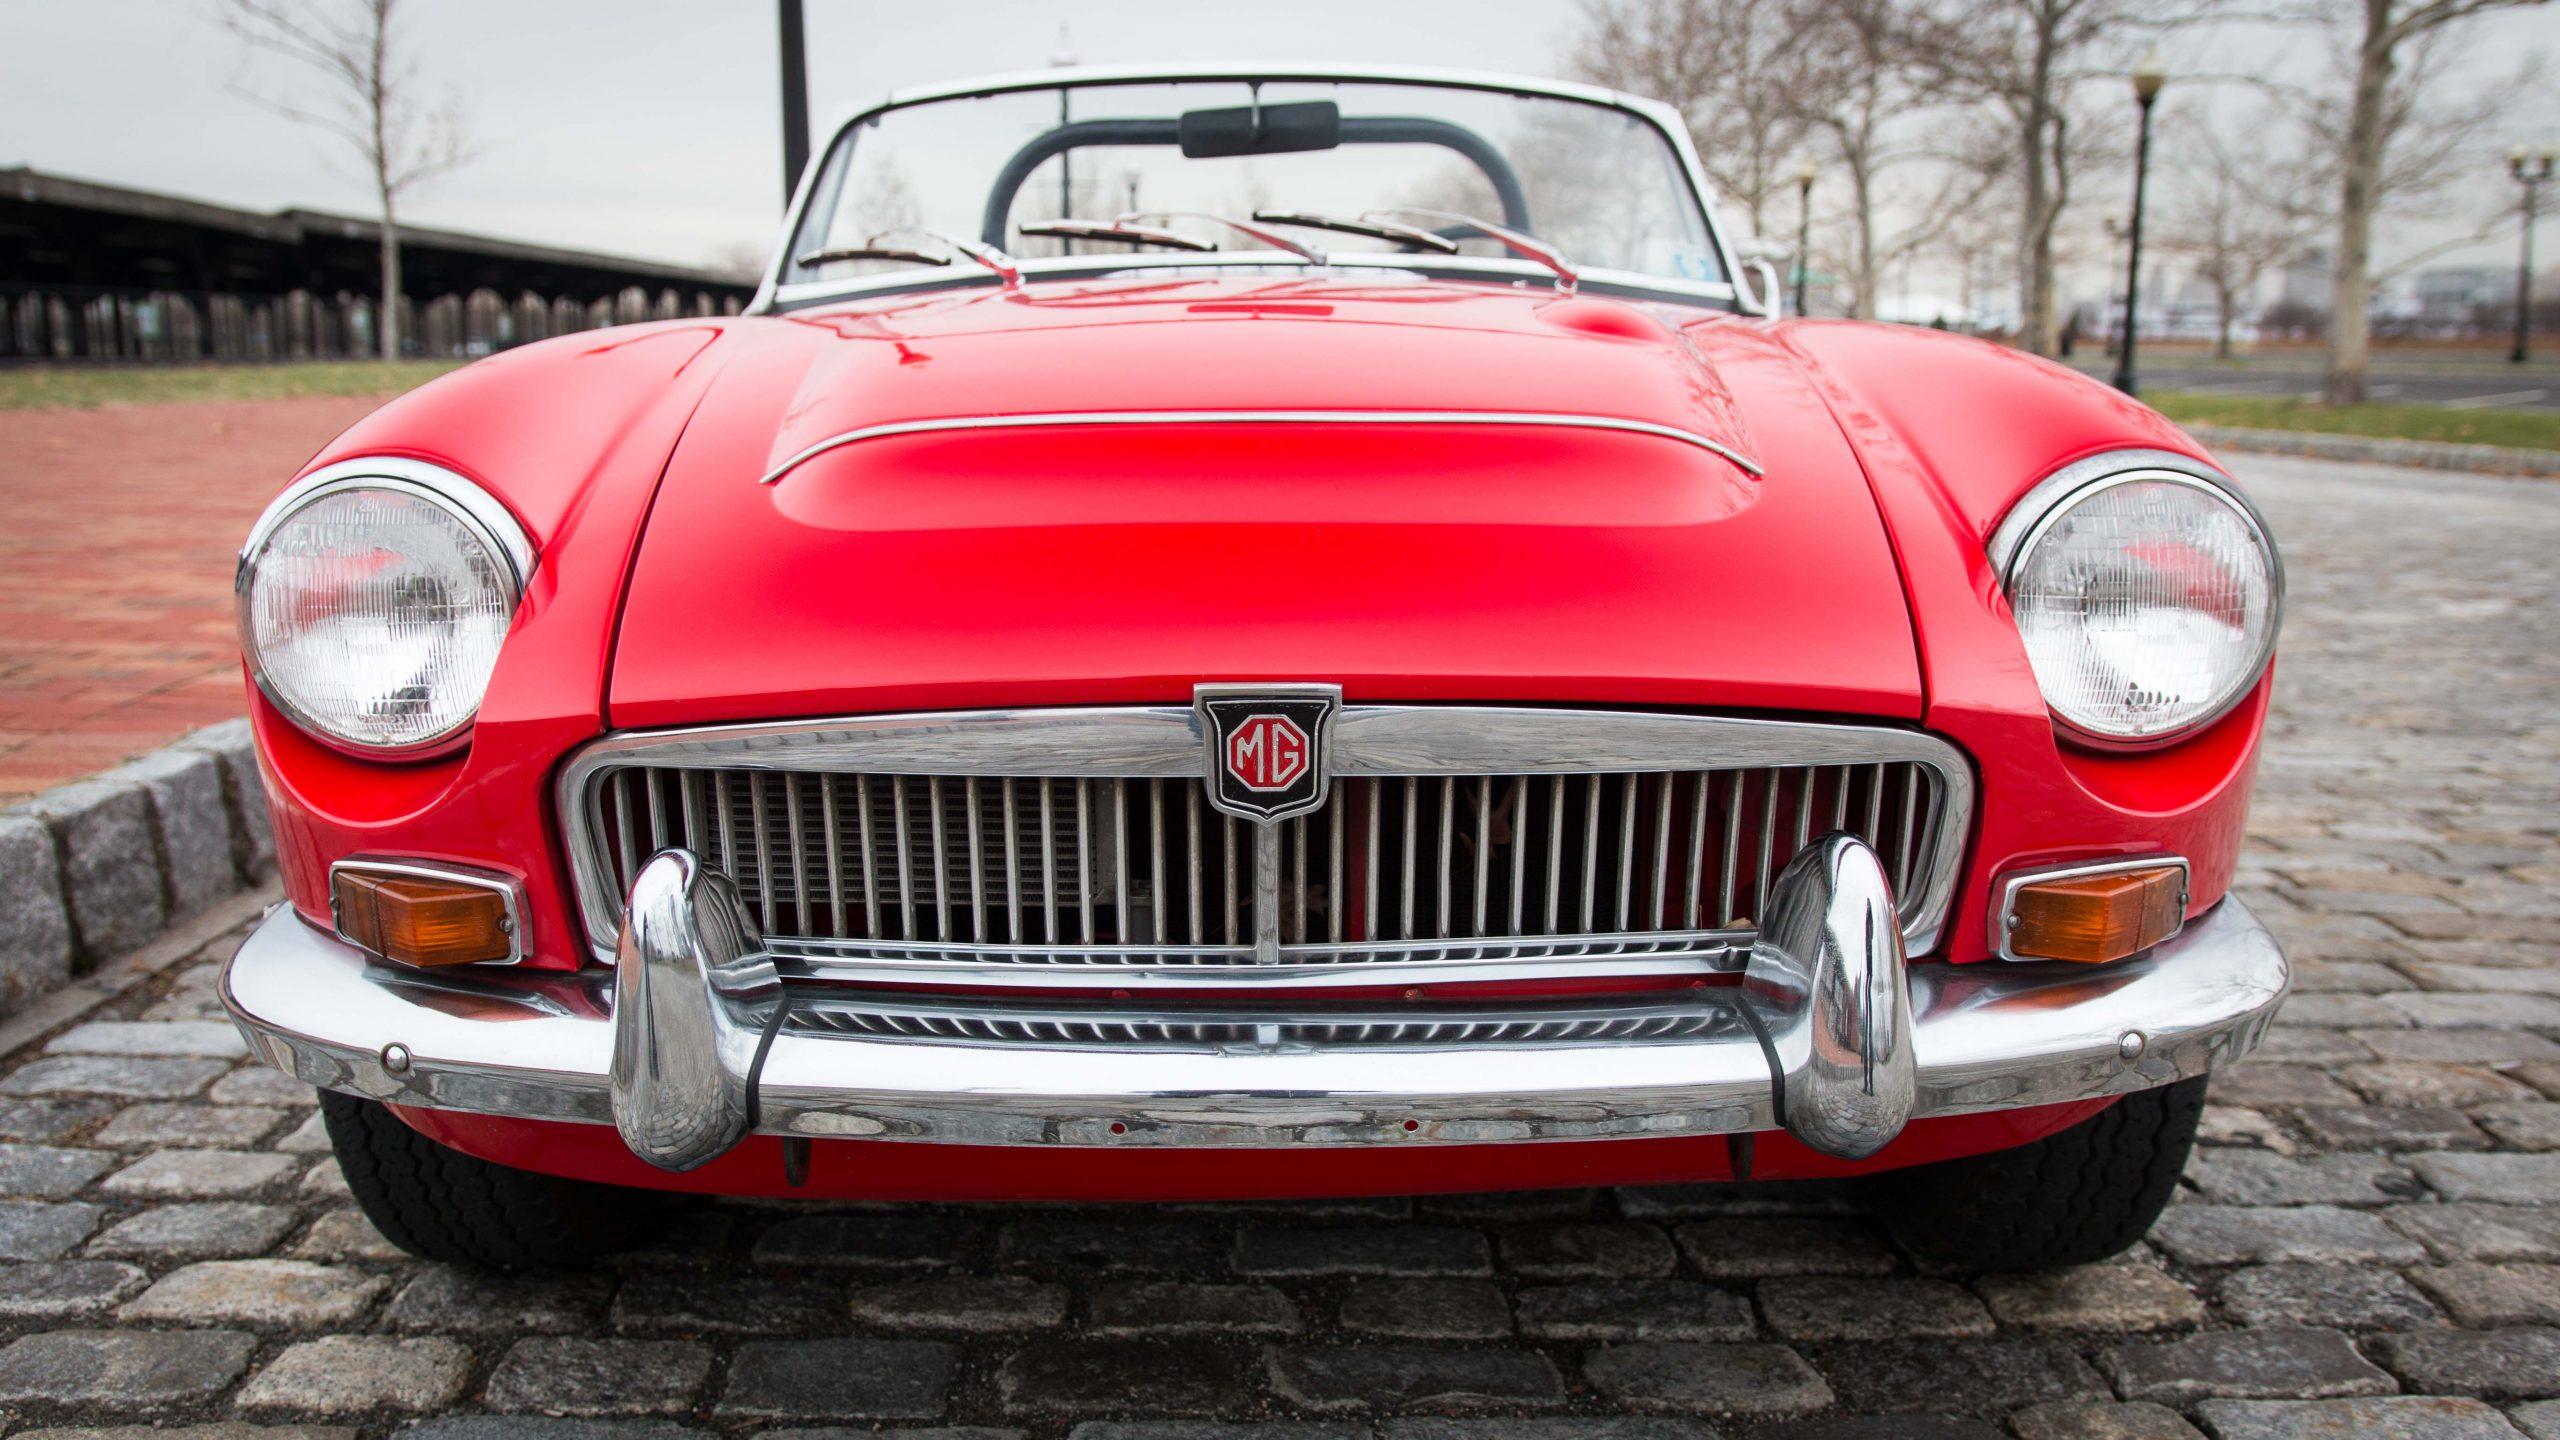 1969 MG MGC front